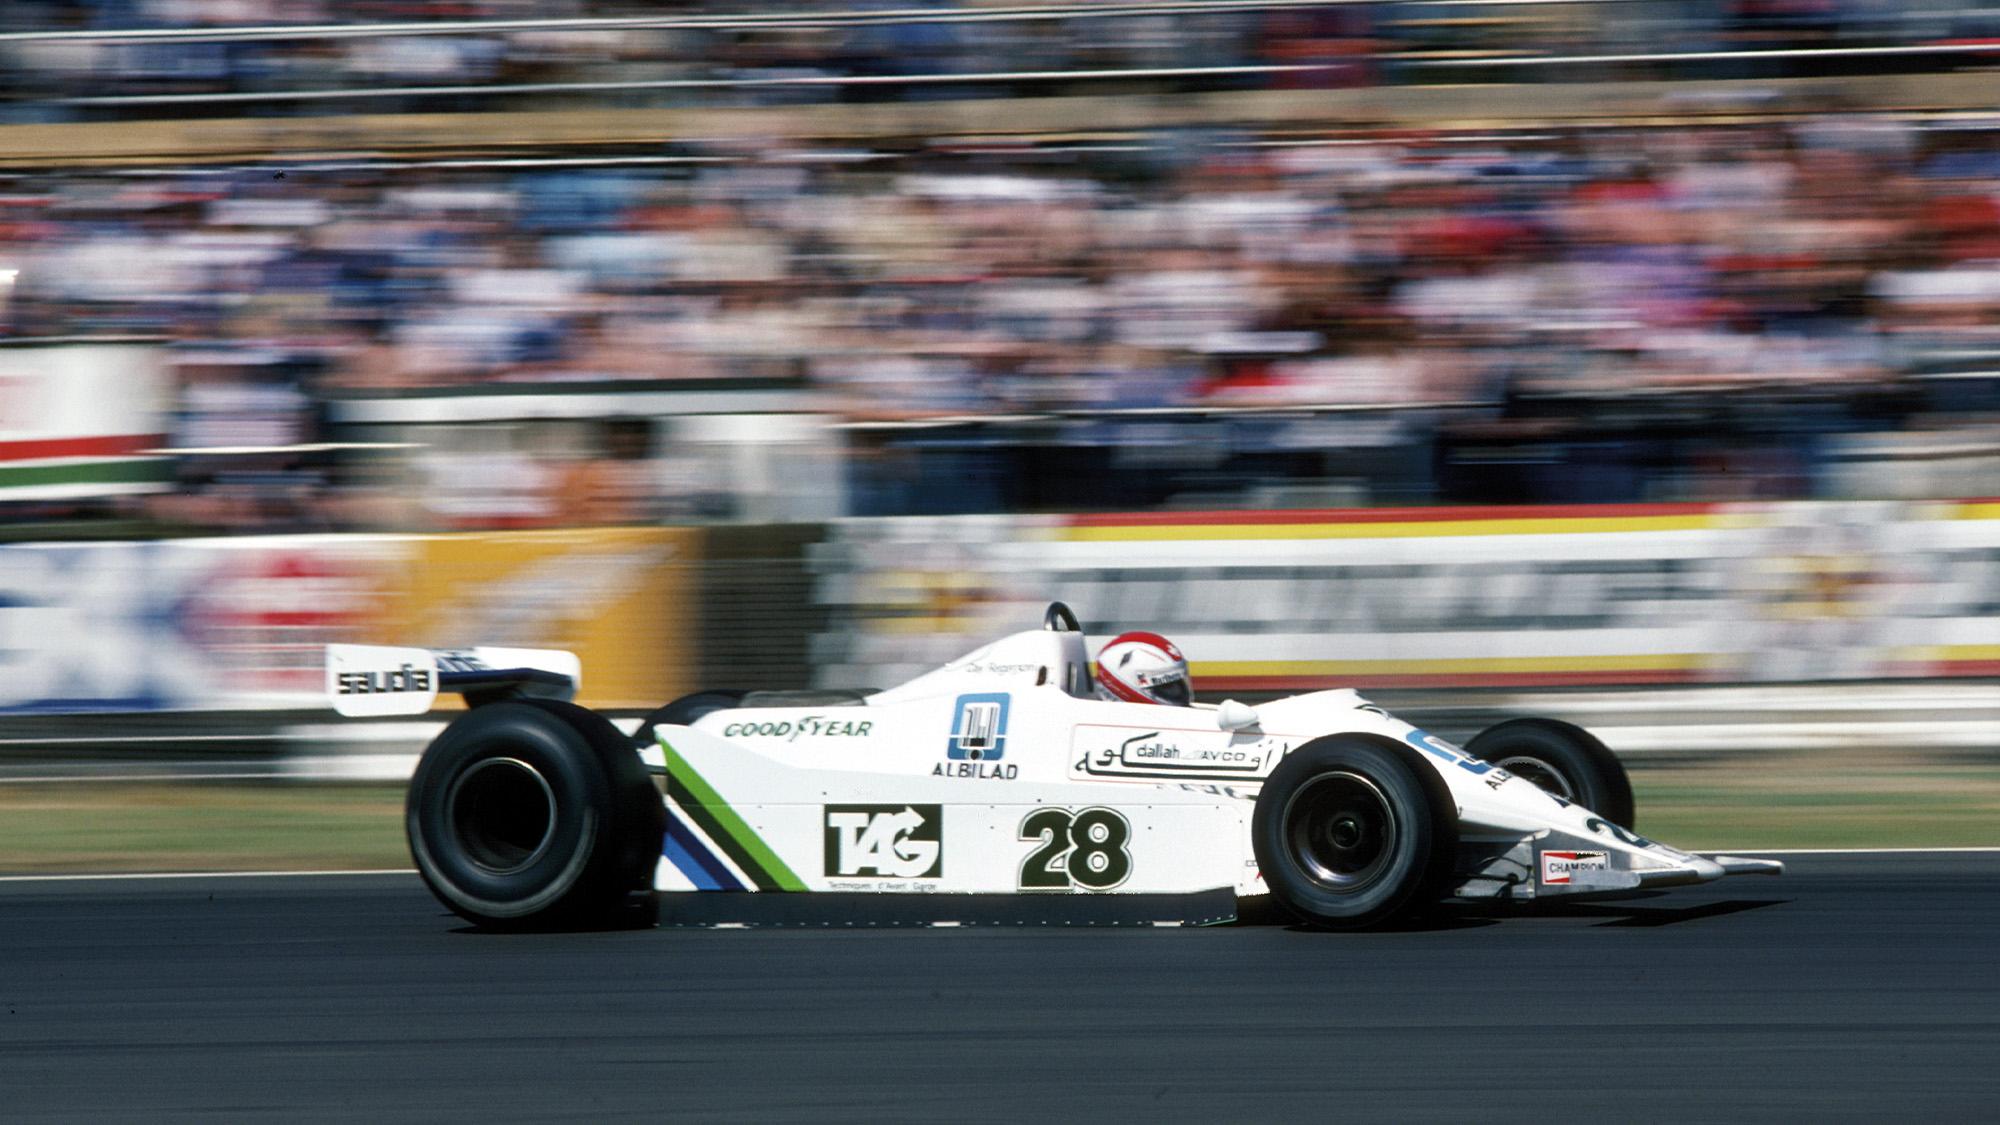 Formel 1, Grand Prix England 1979, Silverstone, 14.07.1979 Clay Regazzoni, Williams-Ford FW07 www.hoch-zwei.net , copyright: HOCH ZWEI / Ronco (Photo by Hoch Zwei/Corbis via Getty Images)